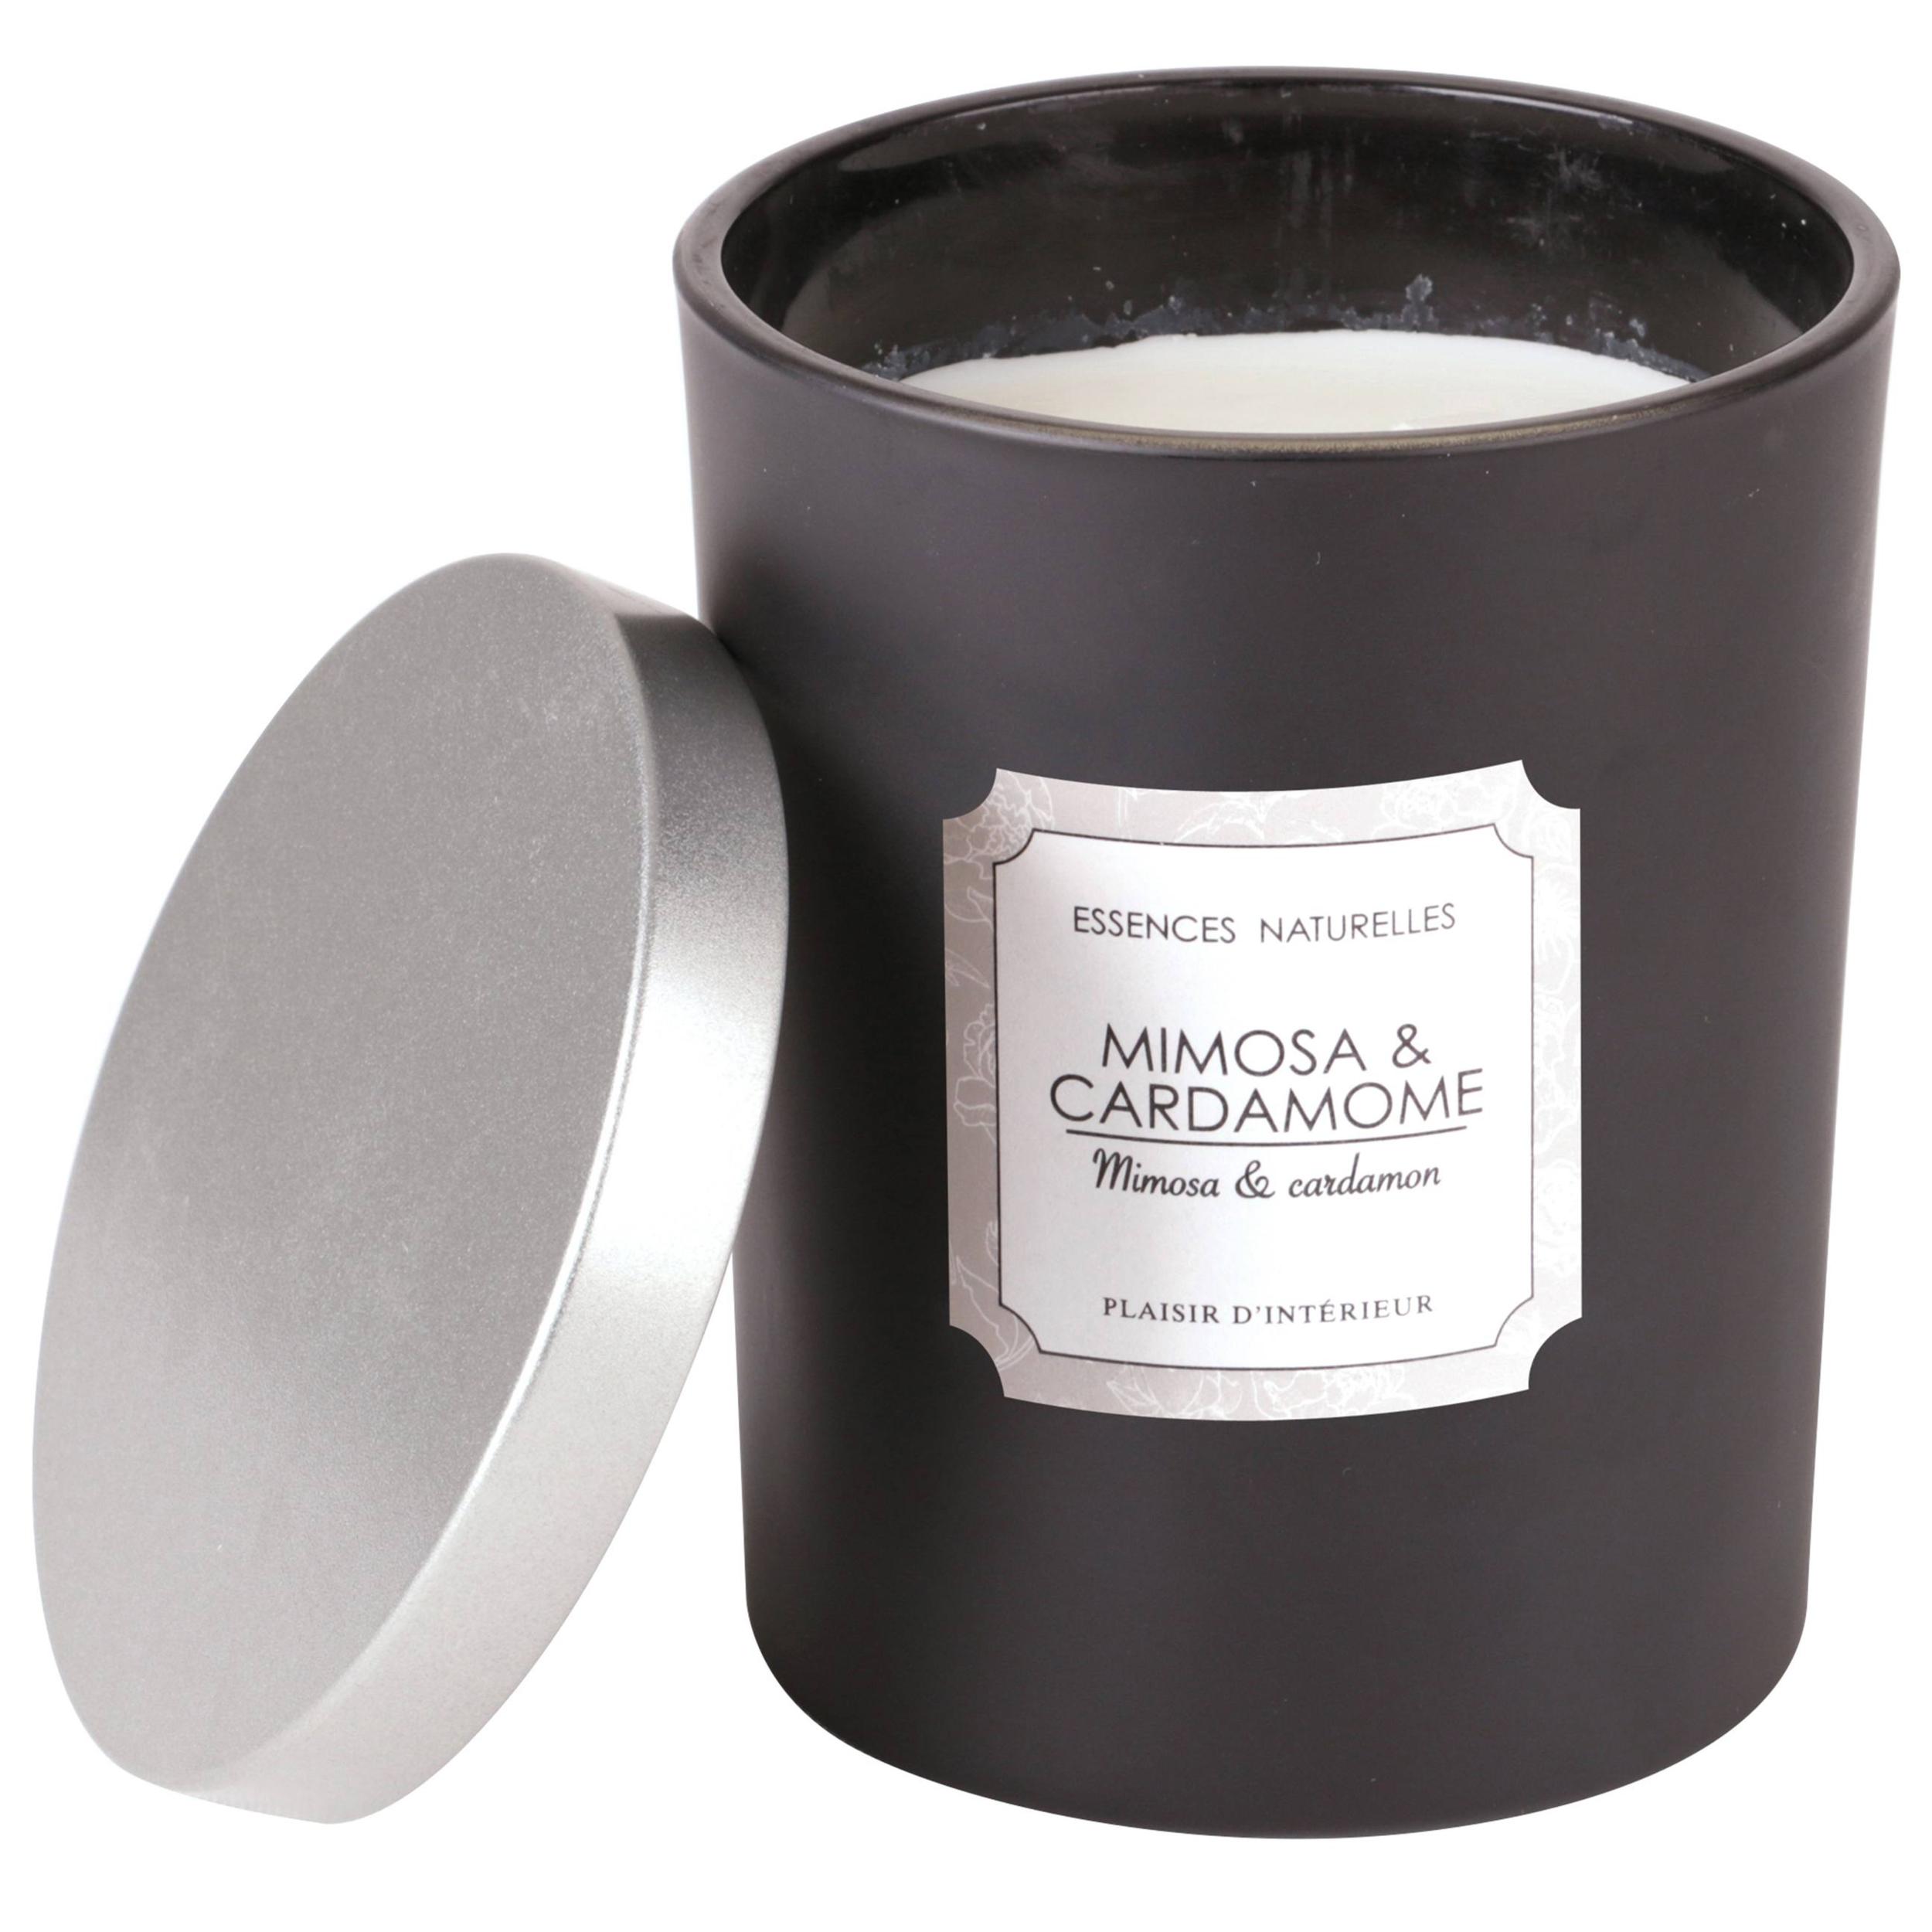 BOUGIE PARFUMEE MIMOSA & CARDAMOME (L)